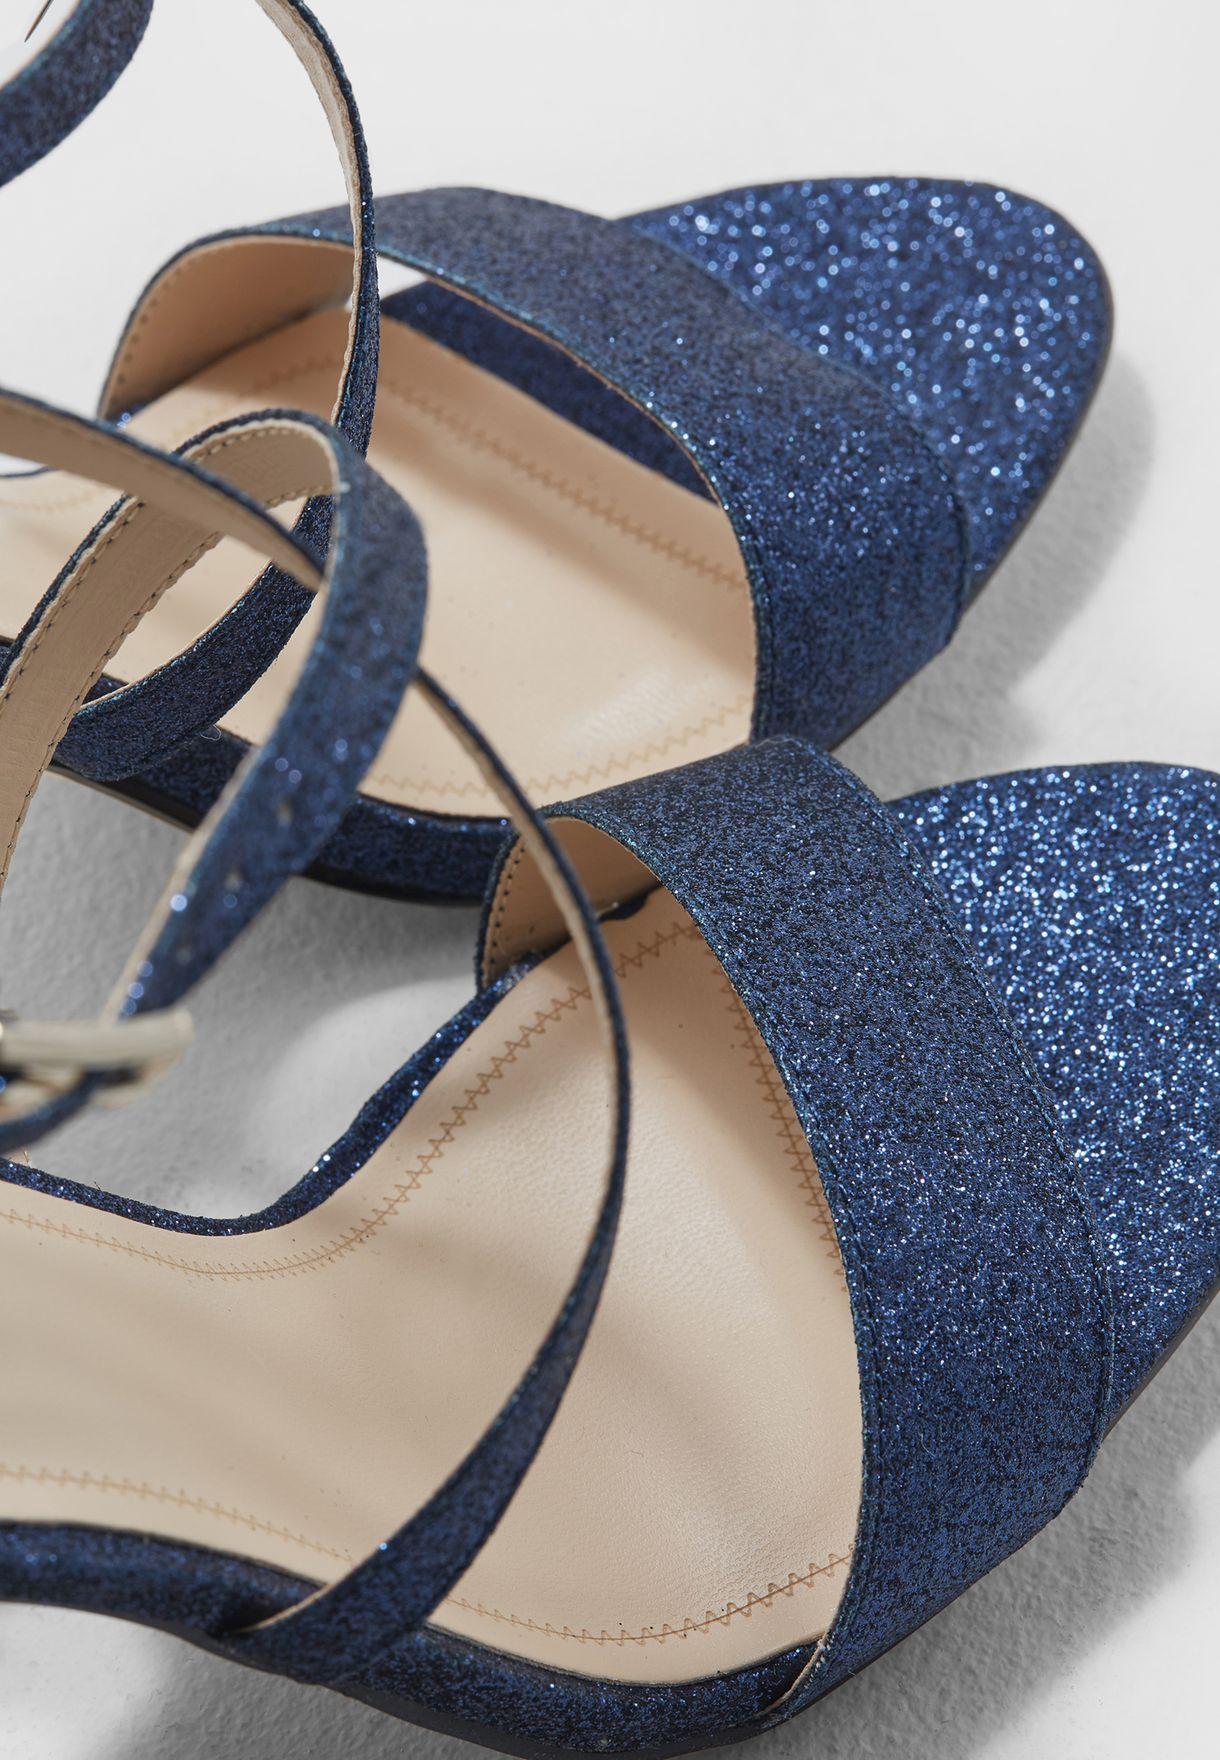 Buy Quiz navy Blue Glitter Cross Strap